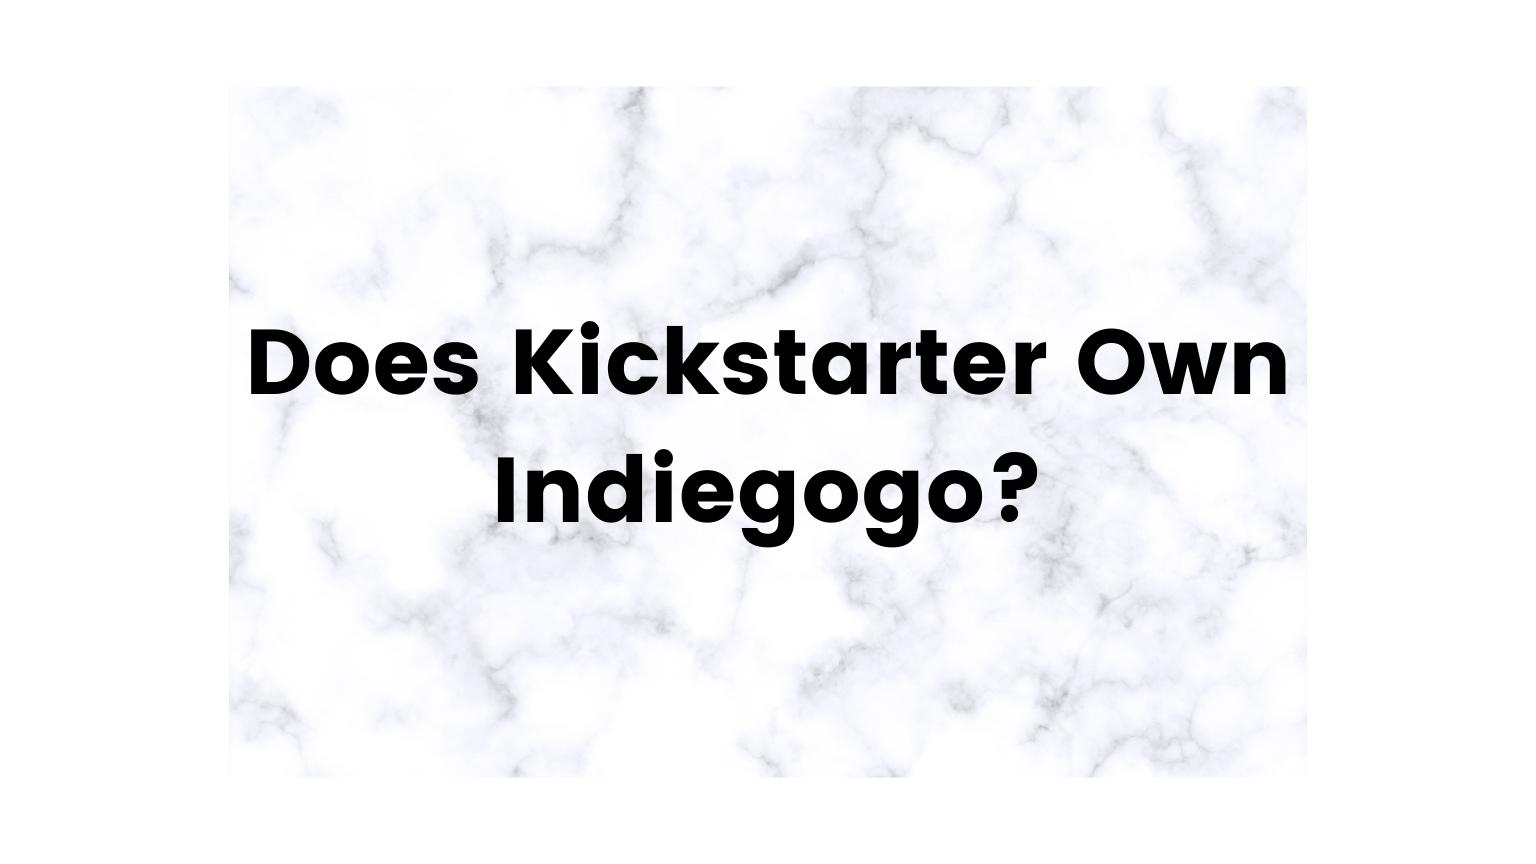 Does Kickstarter Own Indiegogo?